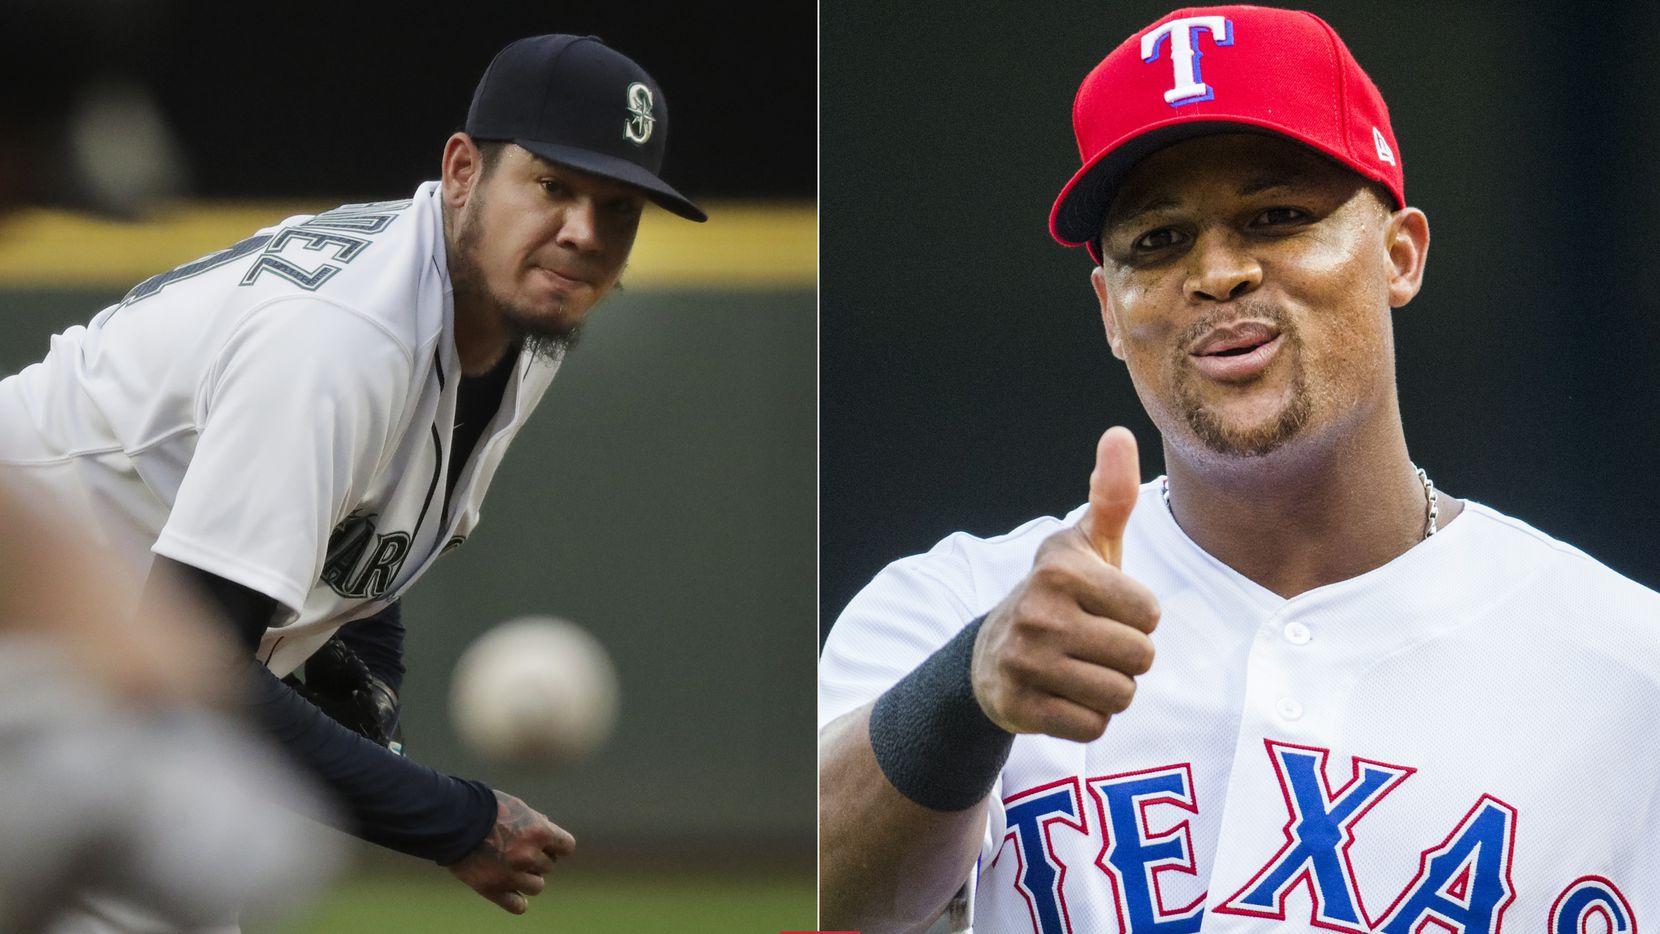 File photos: (Left) Seattle Mariners starting pitcher Felix Hernandez (AP Photo/Ted S. Warren) / (Right) Texas Rangers third baseman Adrian Beltre (Ashley Landis/The Dallas Morning News)